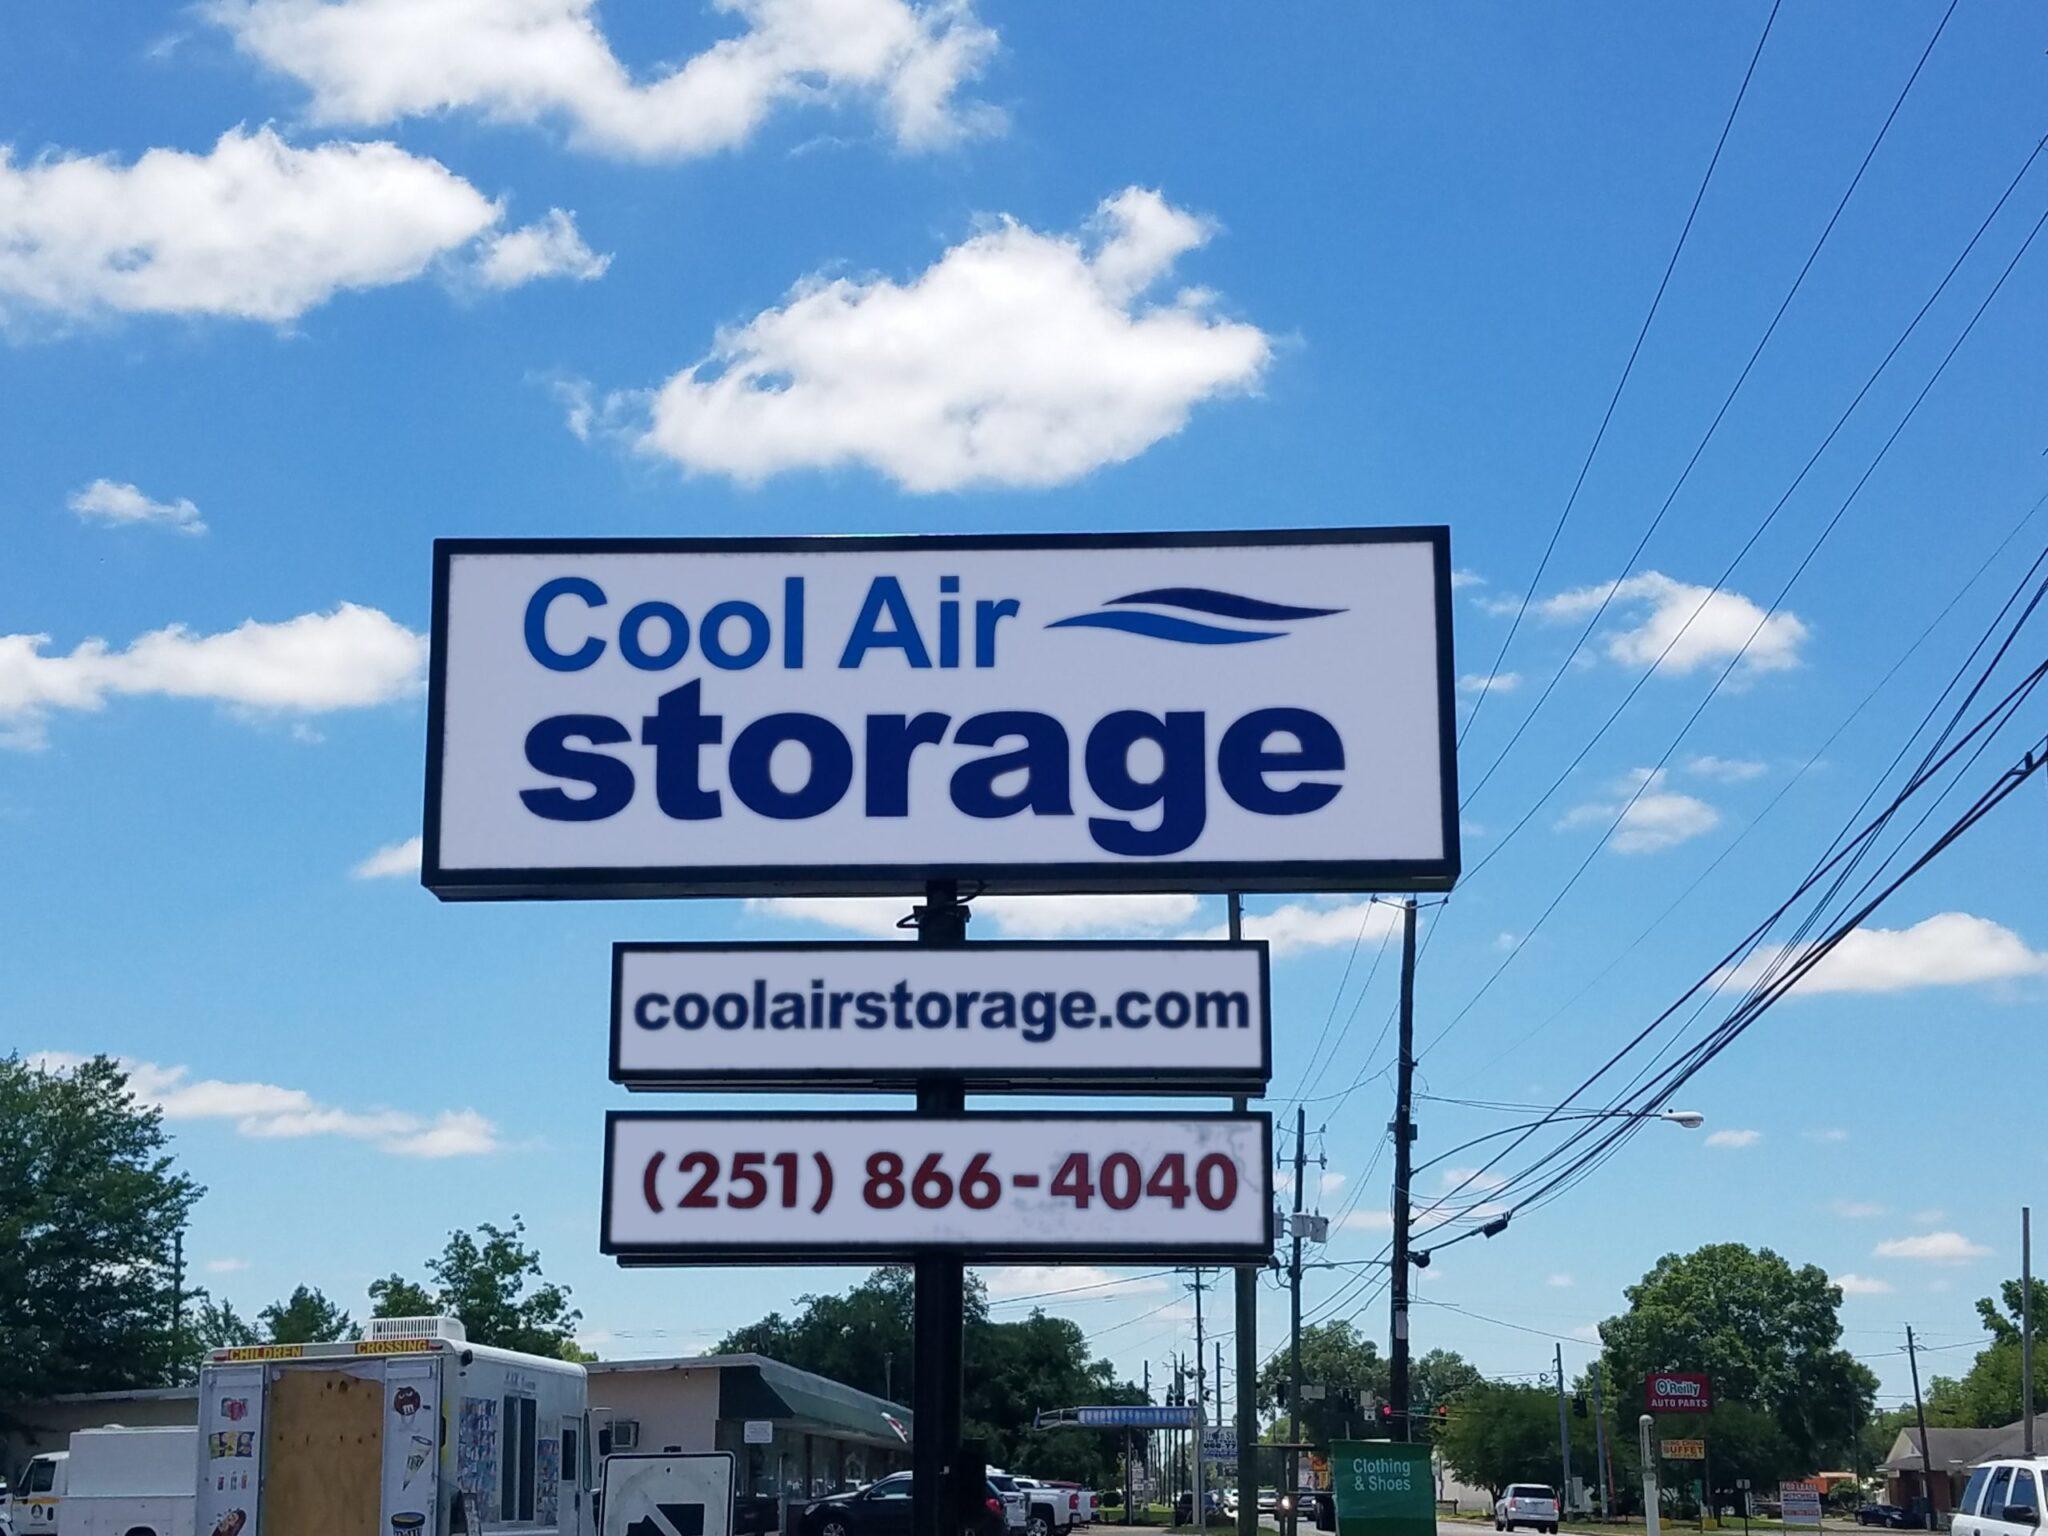 Cool Air Storage